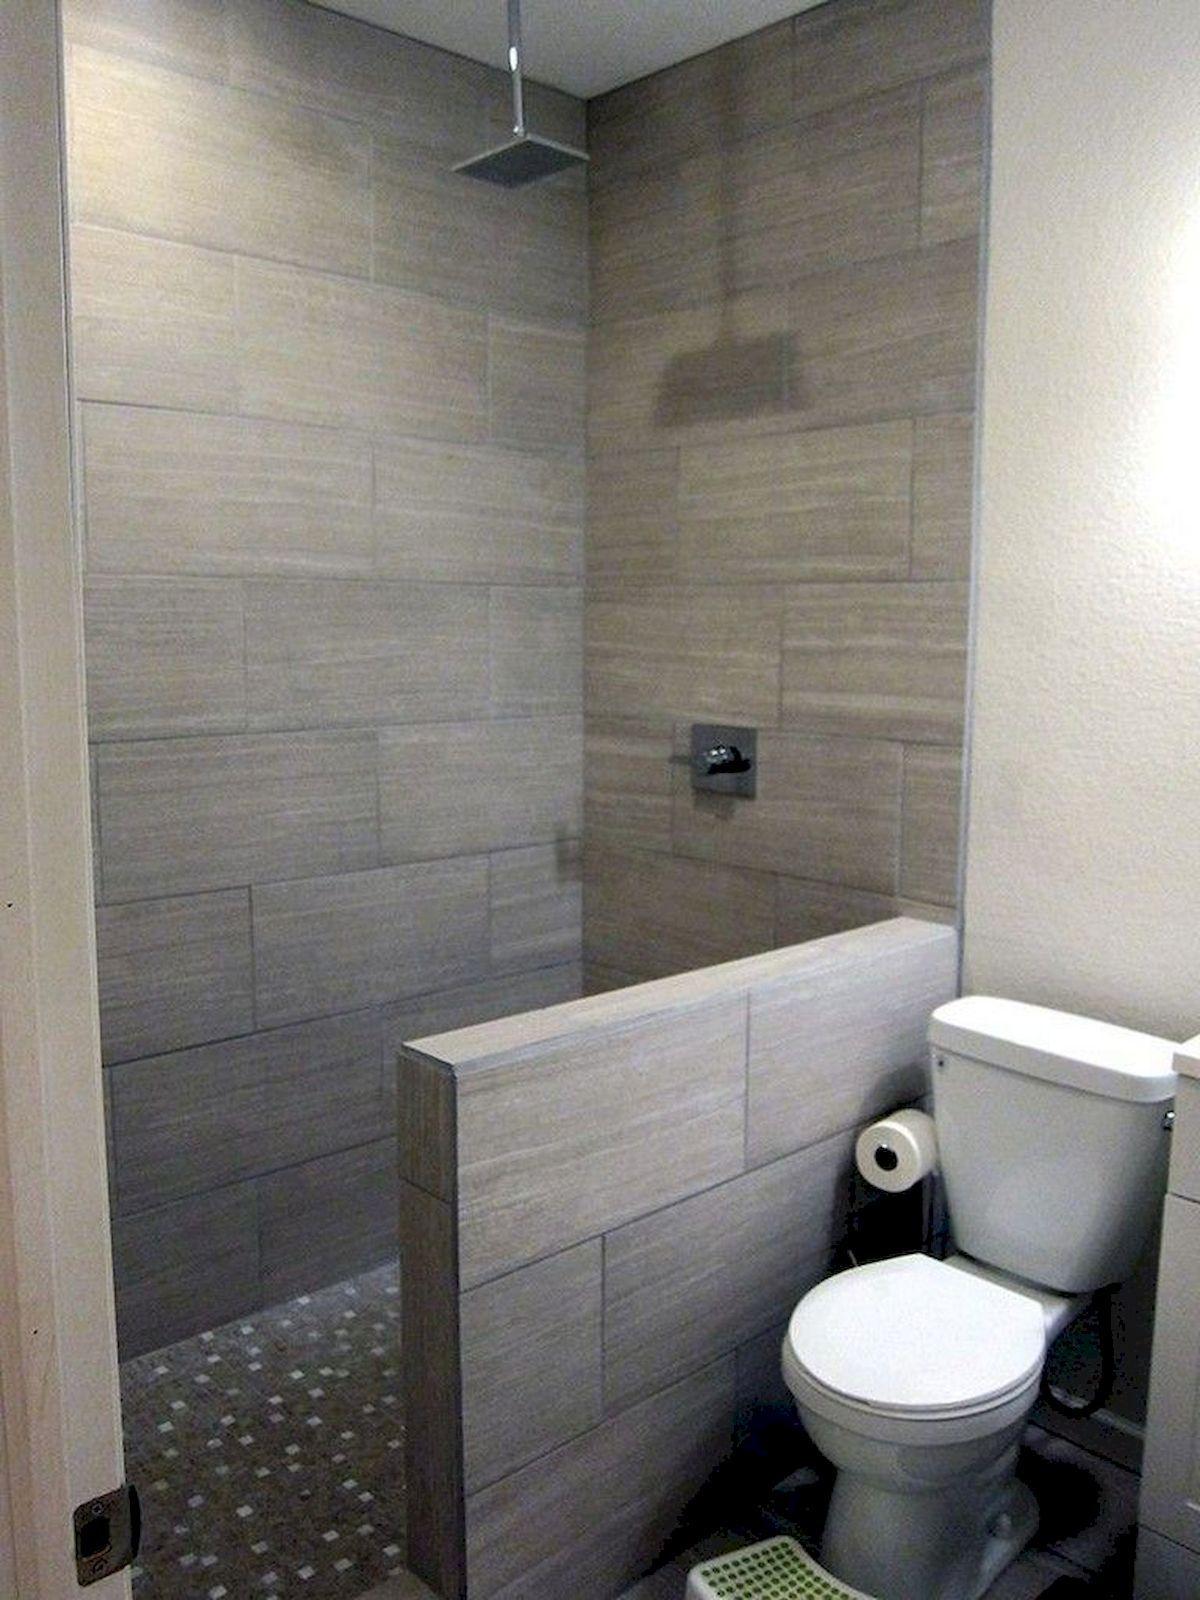 30 Stunning Small Bathroom Ideas On A Budget | Small ... on Small Space Small Bathroom Ideas On A Budget id=42054